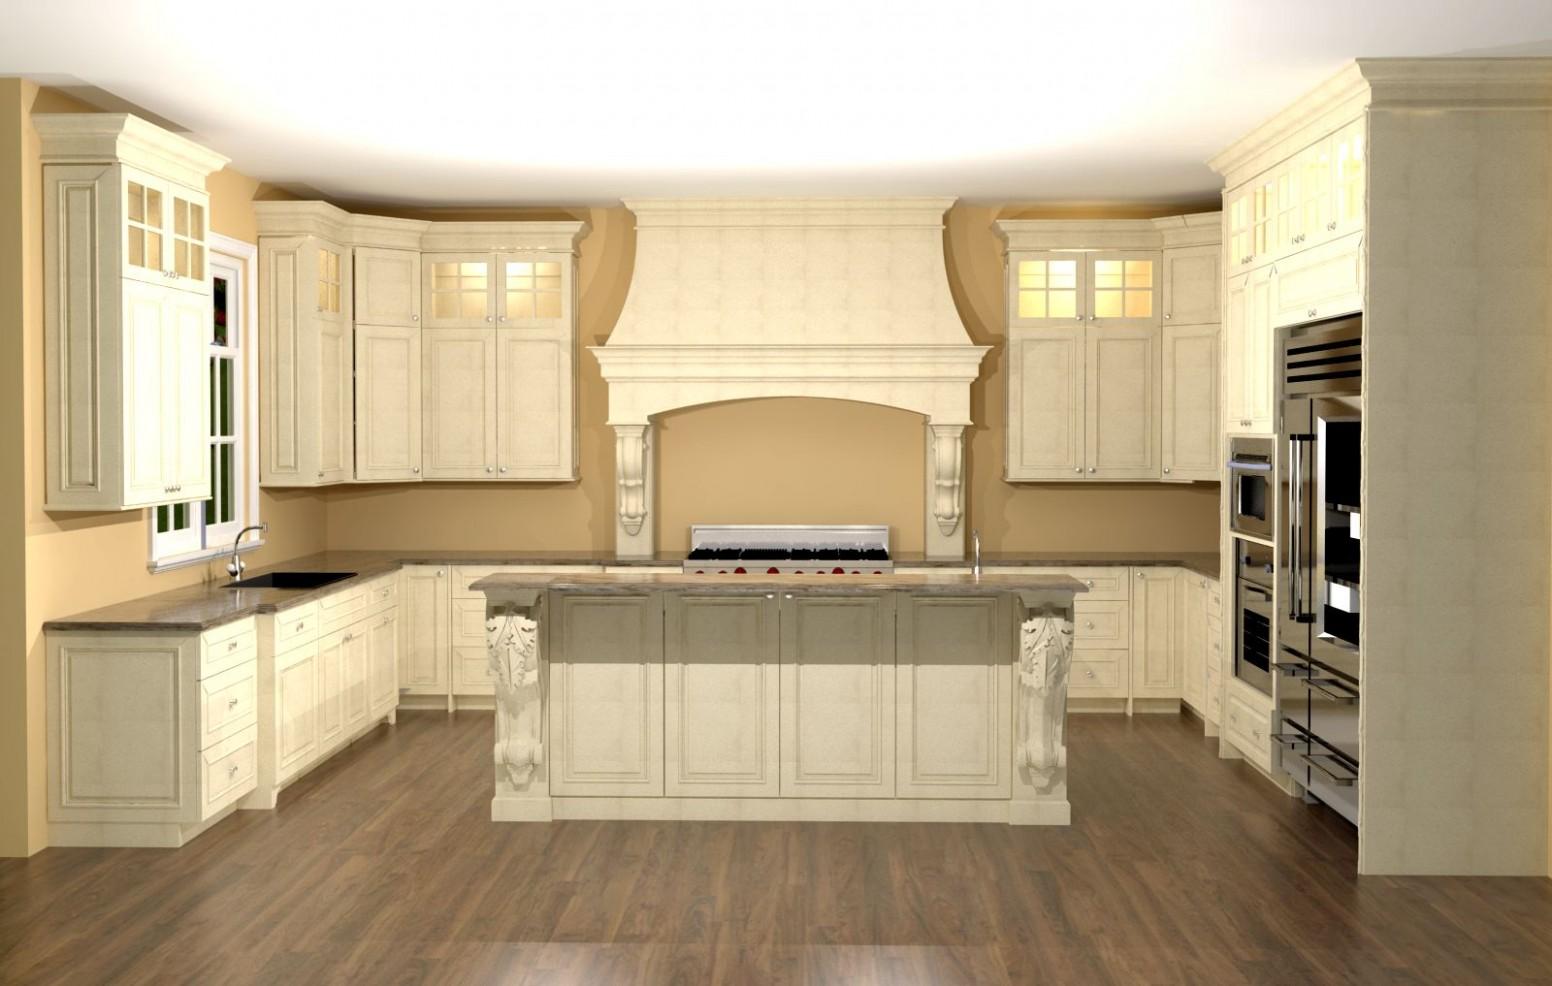 Ivory Kitchen Cabinets Photo Home Design Ideas Vintage Cream  - 1950S Kitchen Cabinets Corbel